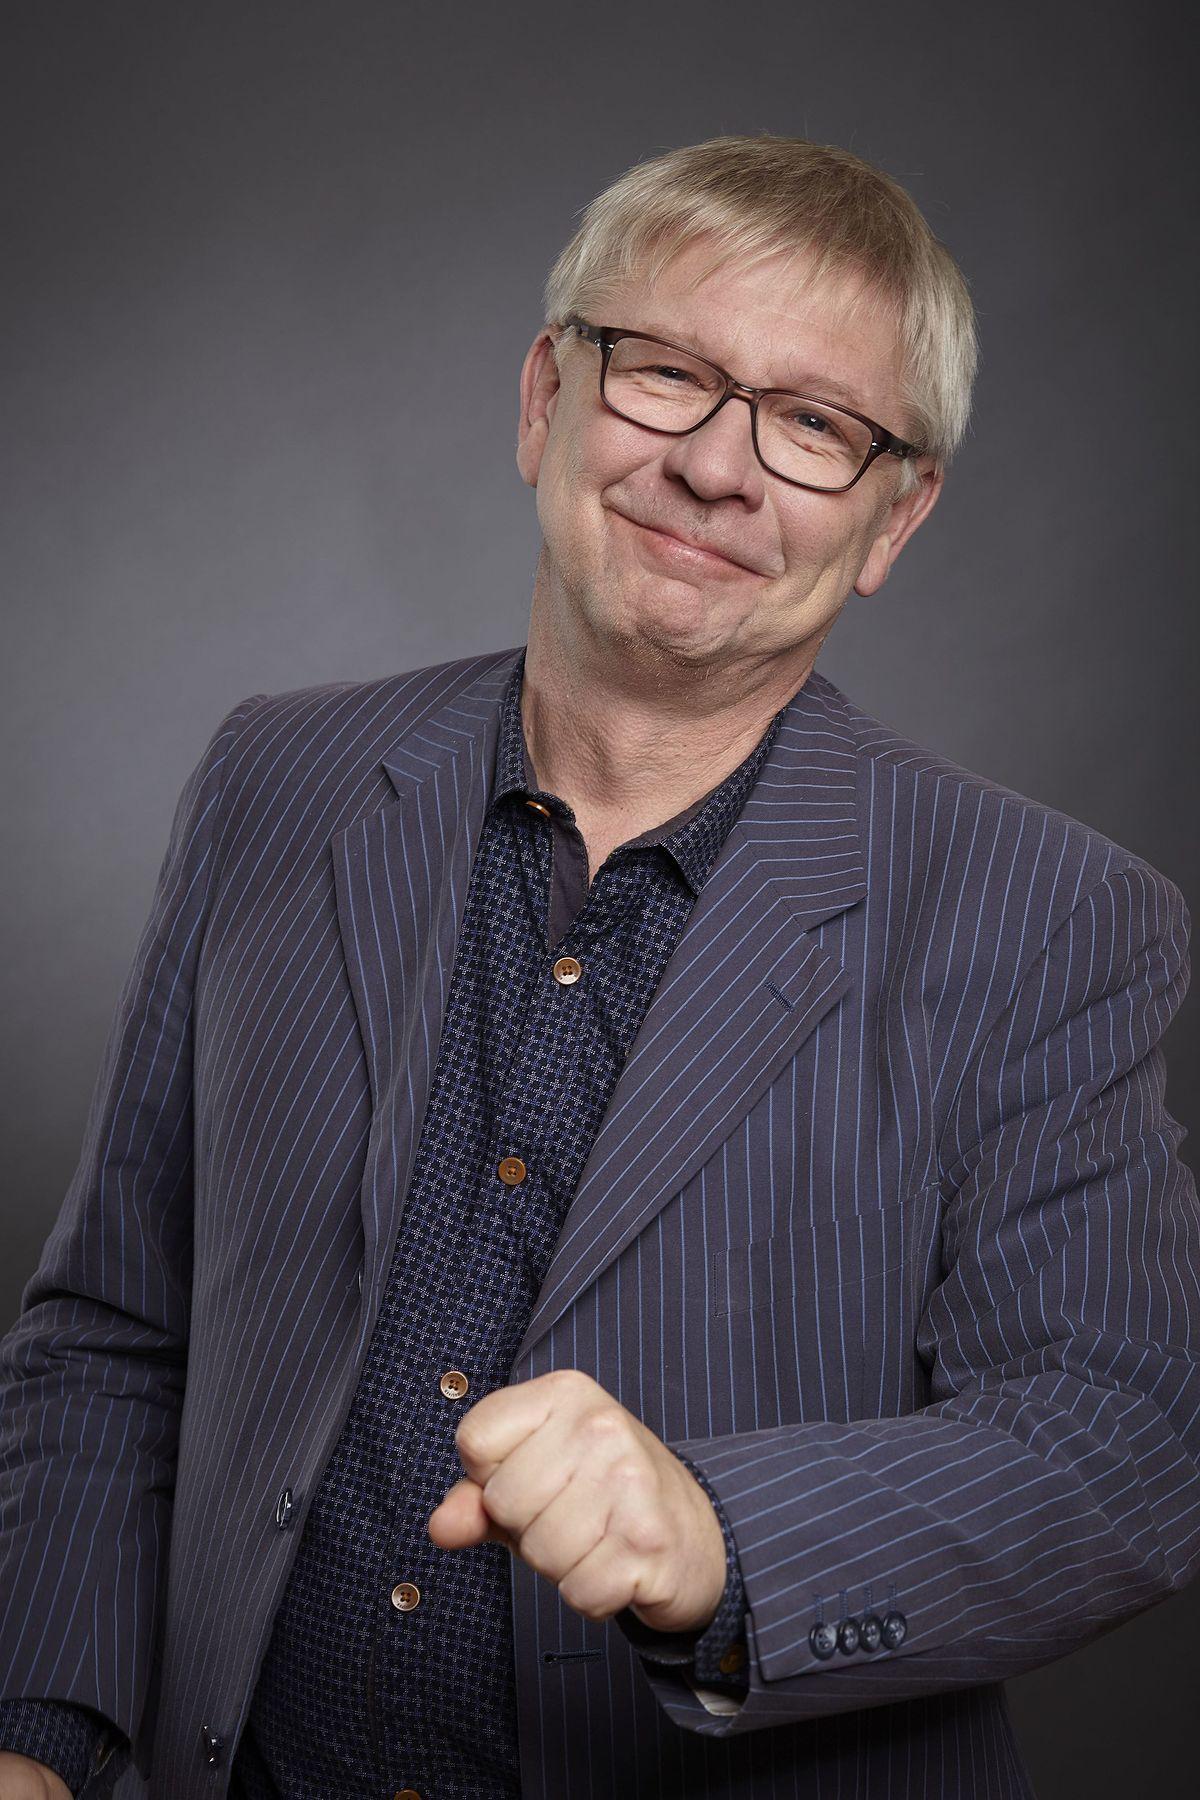 Thomas Gabriel (composer) - Wikipedia